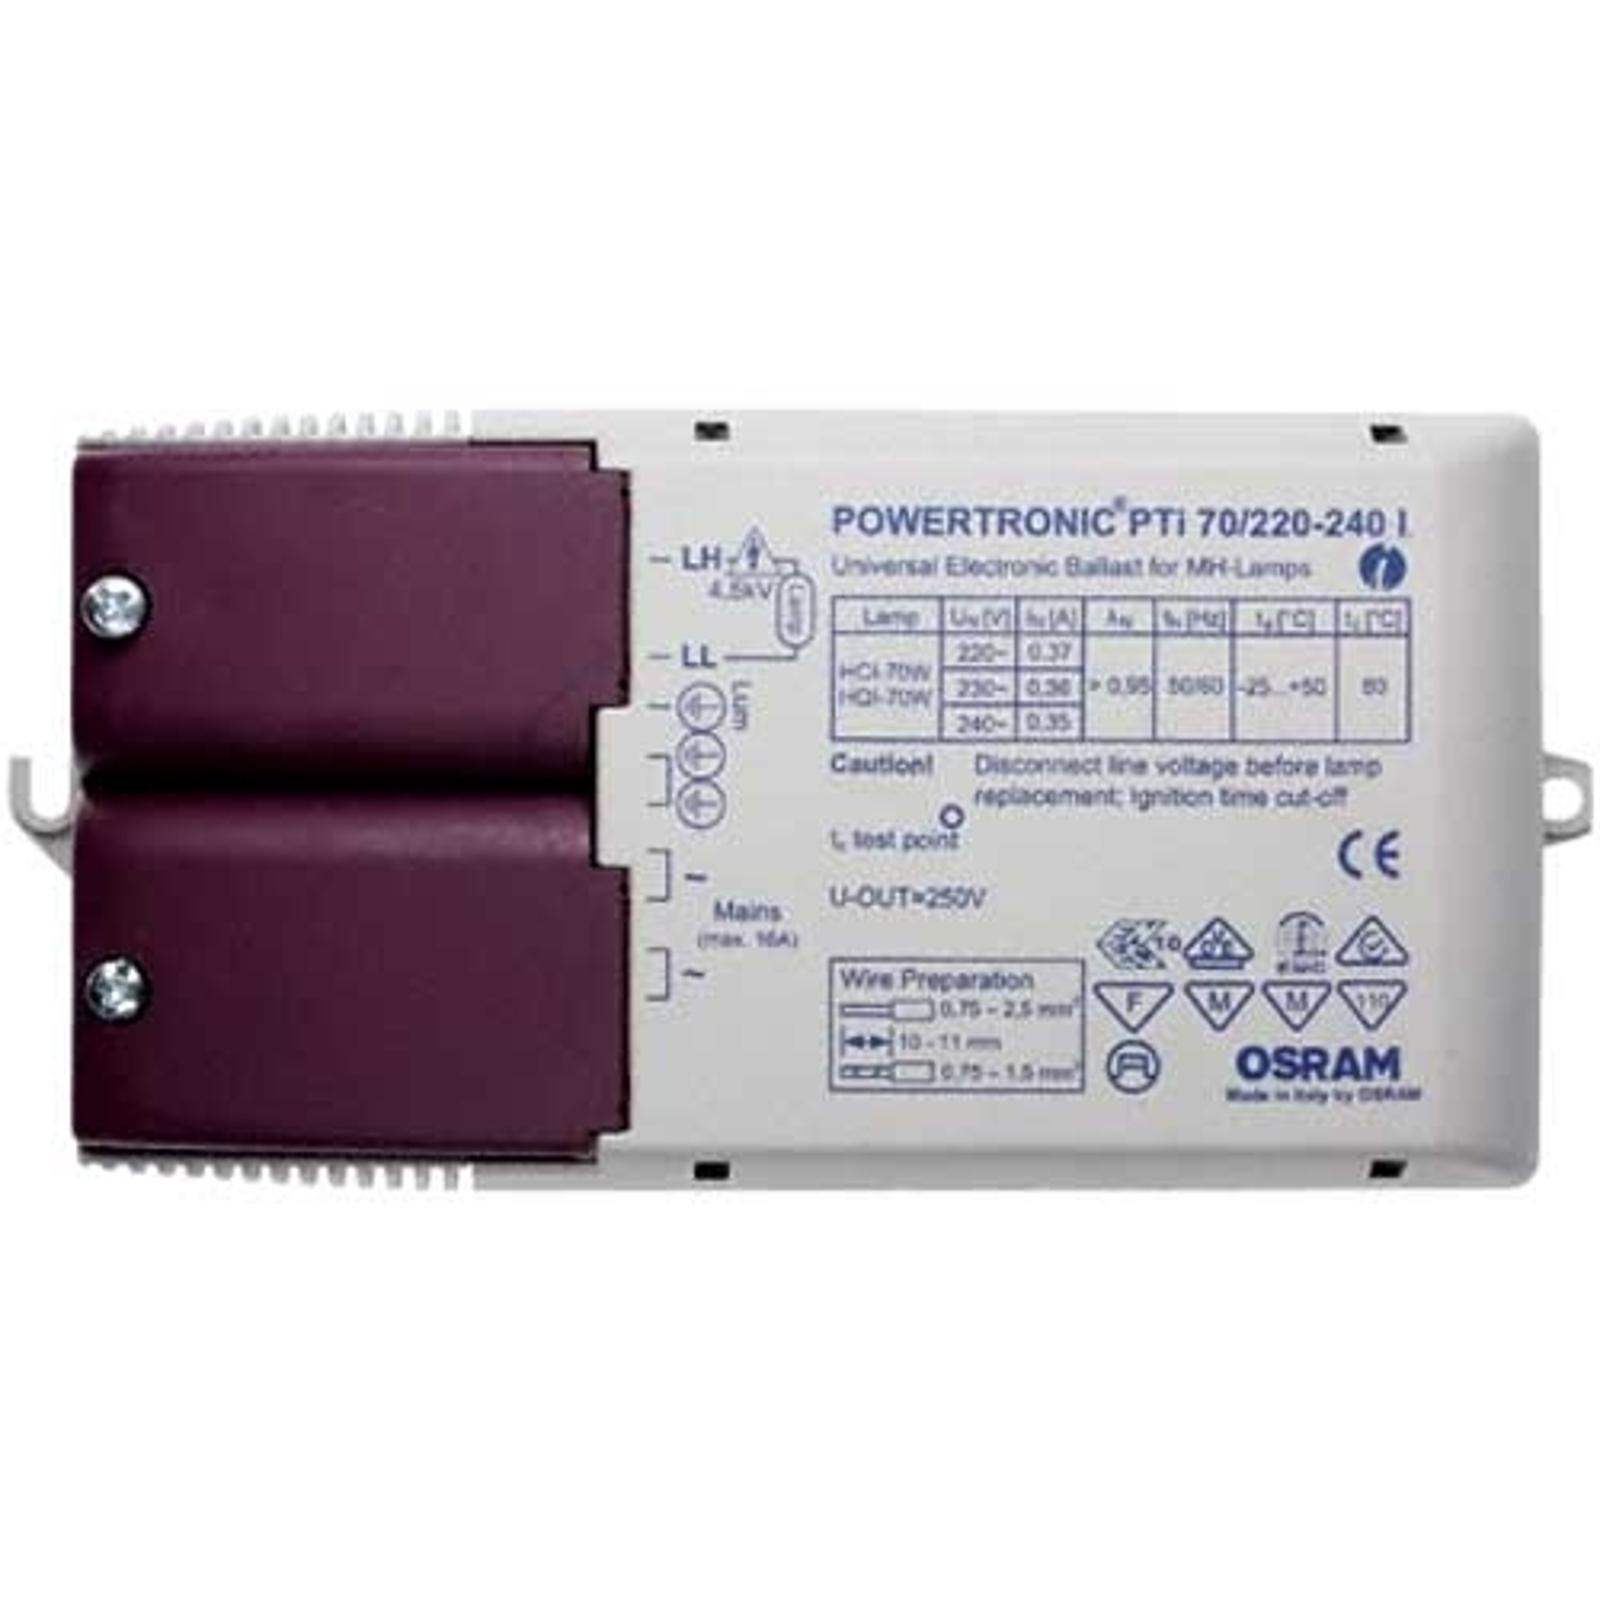 Elektronisches Vorschaltgerät PTi 70/220-240 I